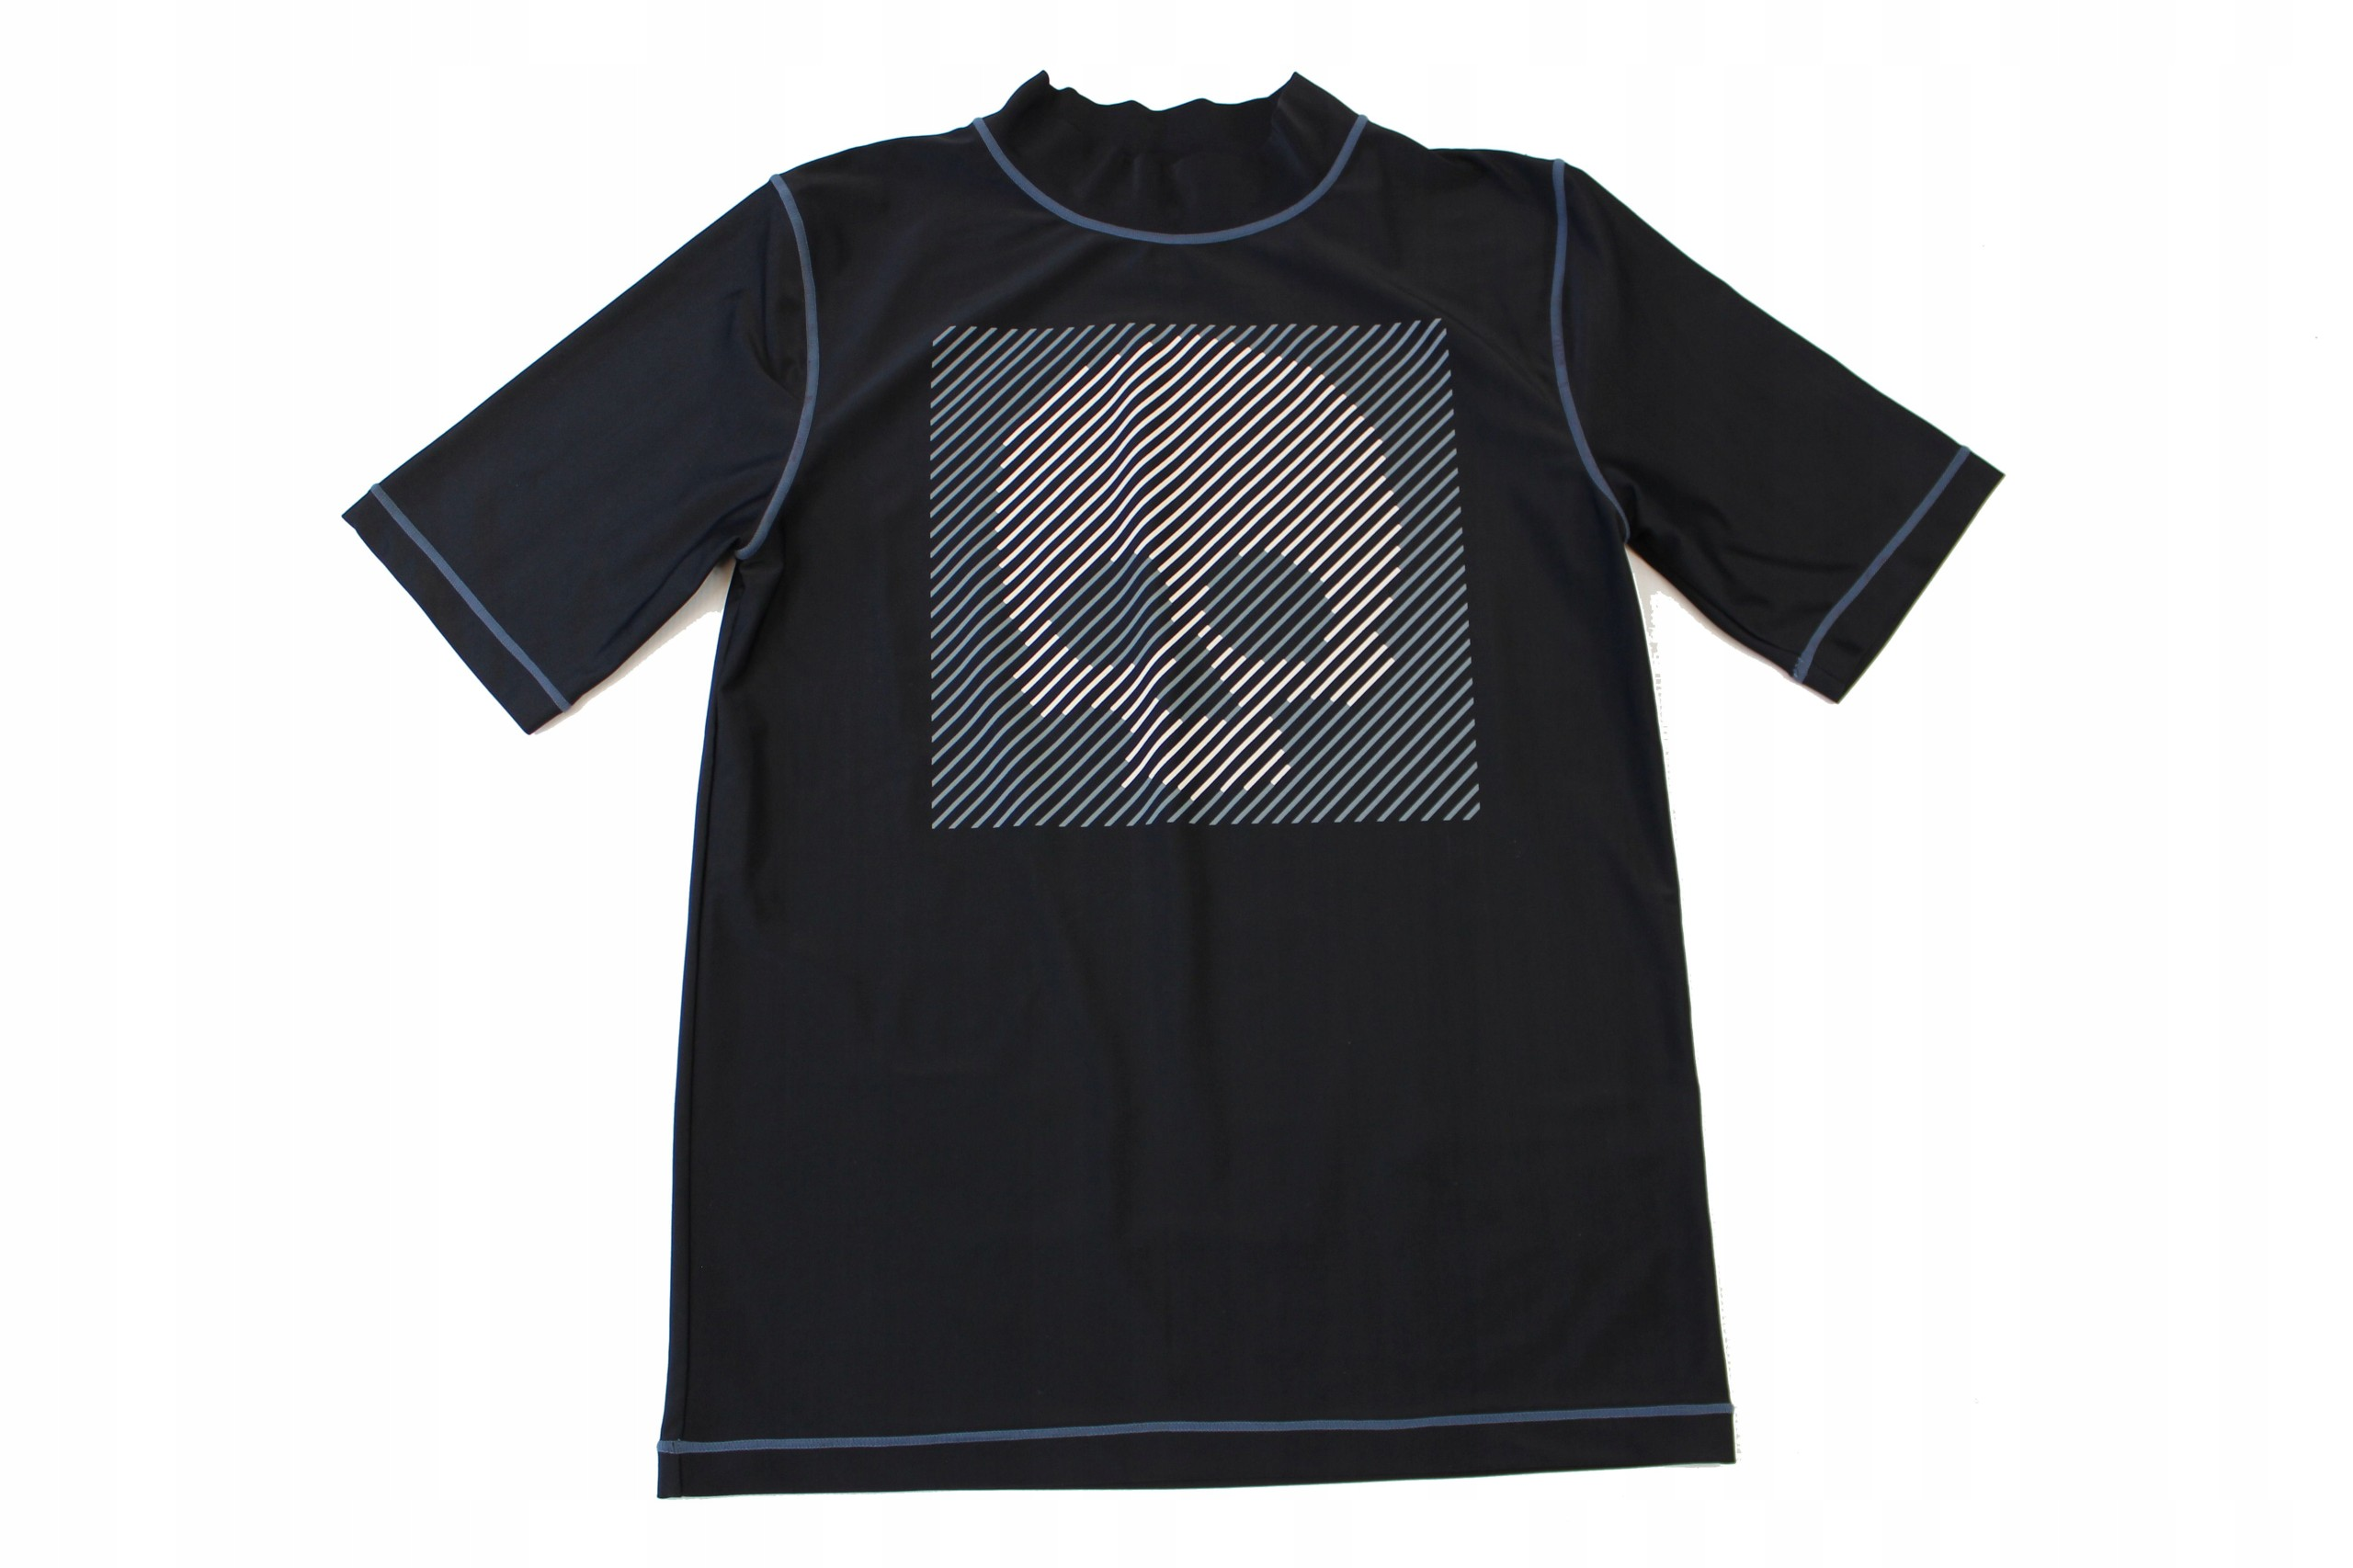 Koszulka ochronna CHEROKEE r XS (A4519)